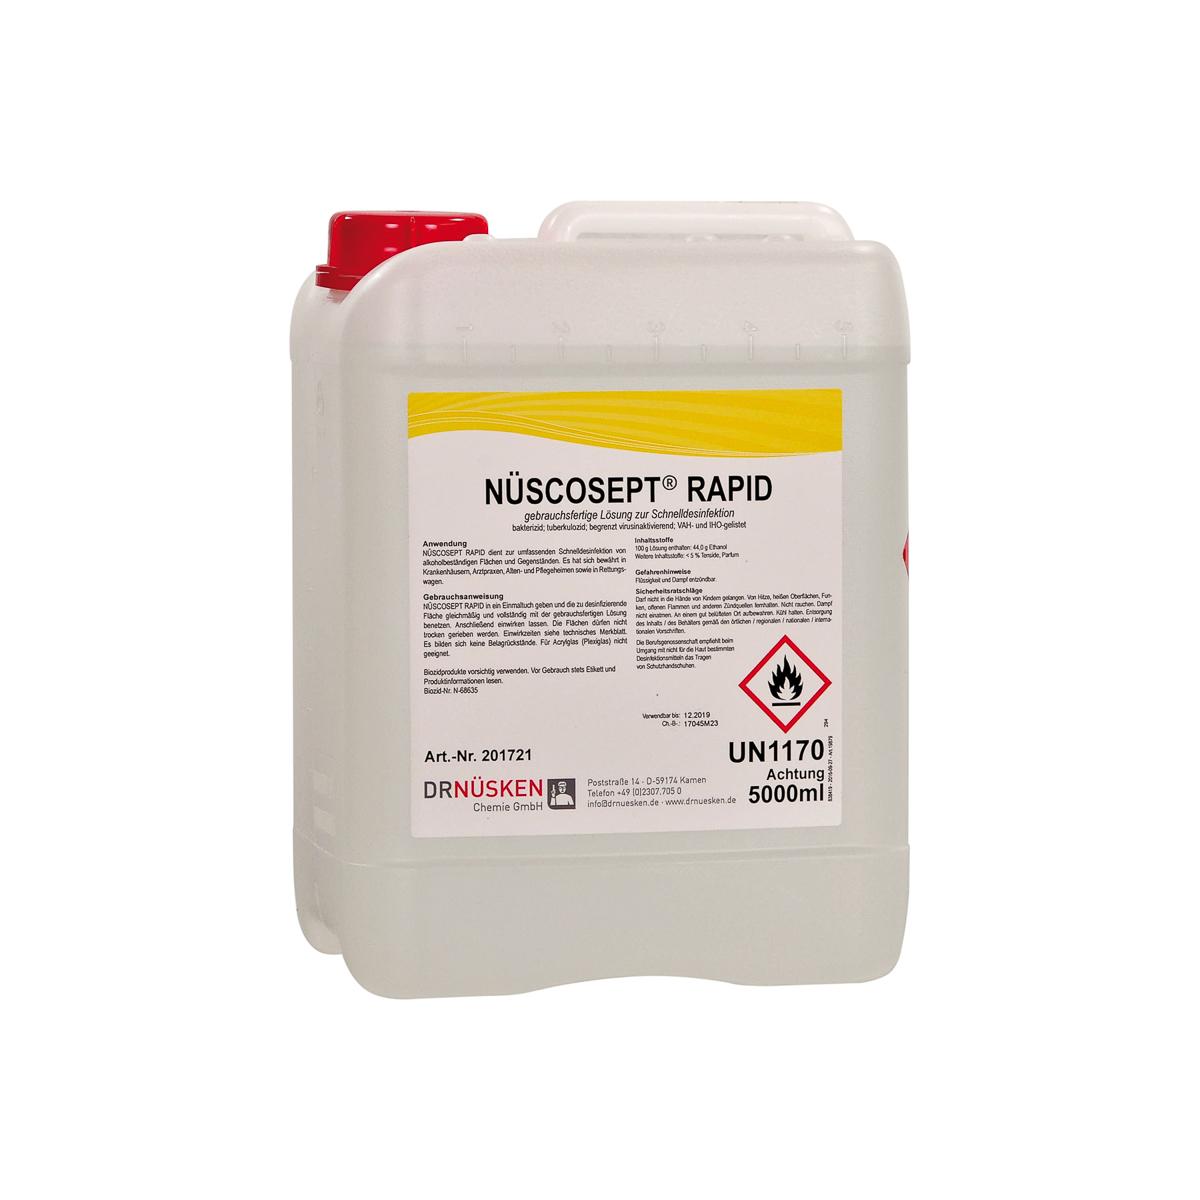 Nüscosept® Rapid 5 Liter